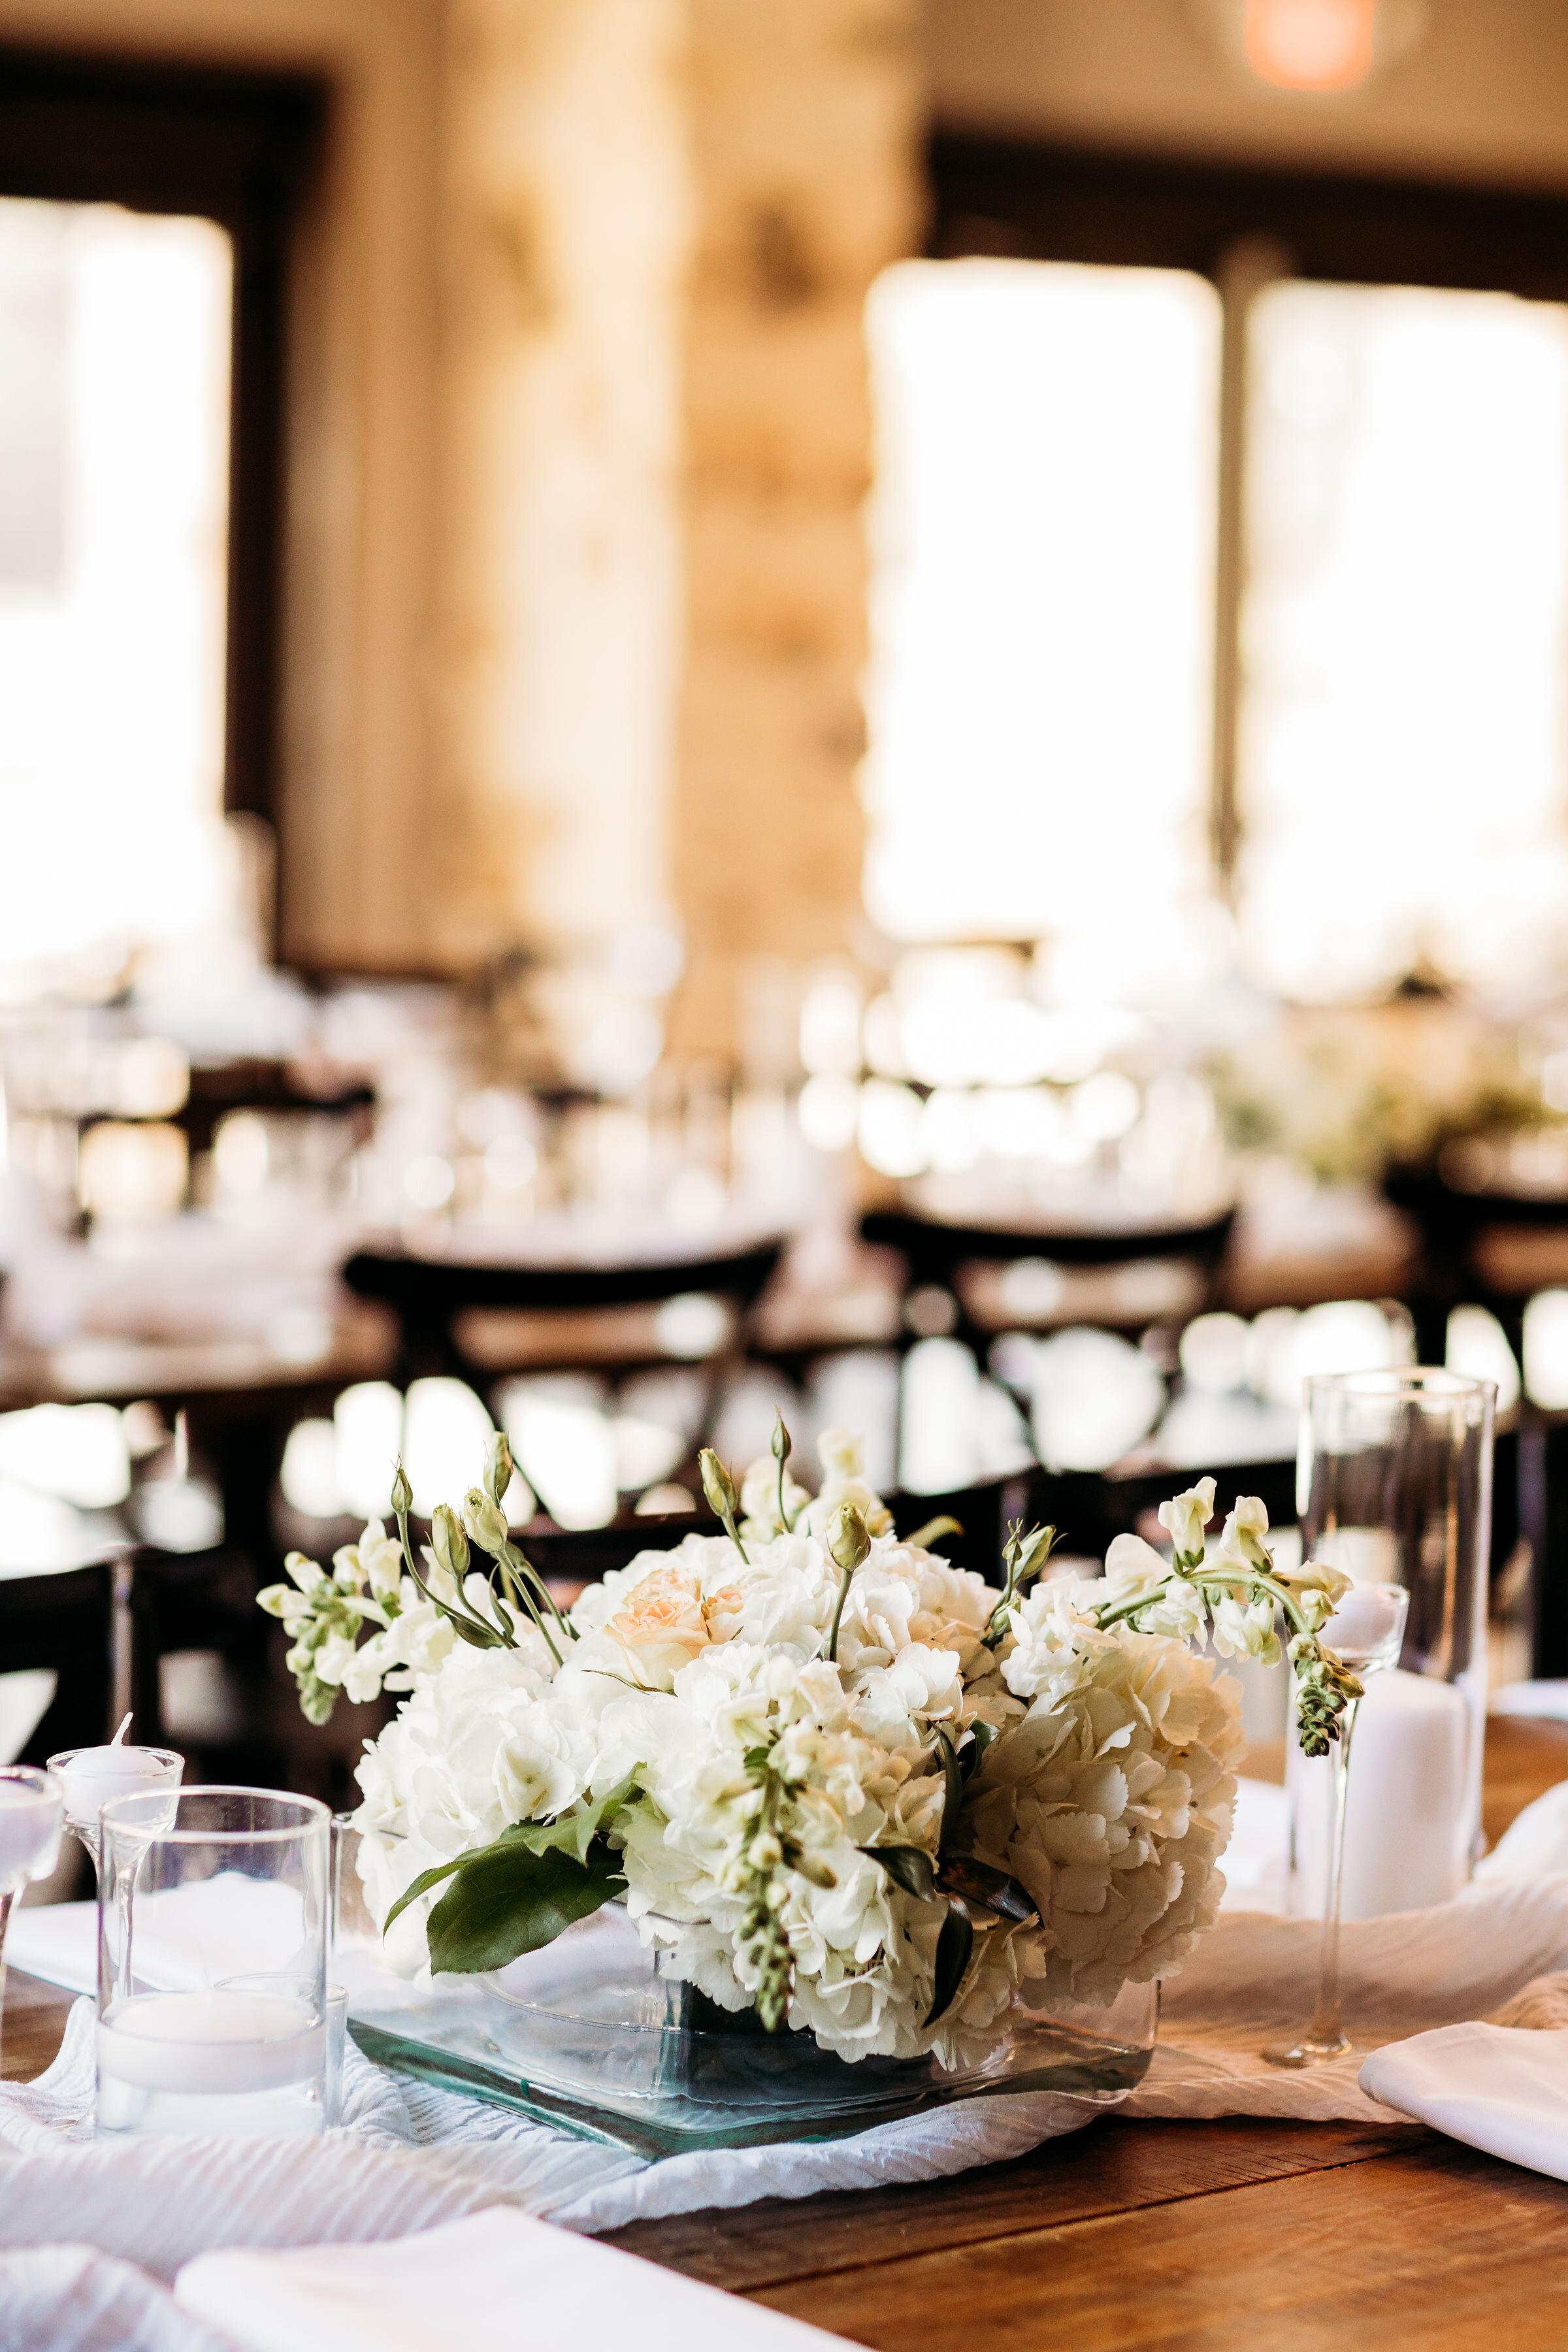 Villarreal_Wedding_Details_and_Getting_Ready-125.jpg